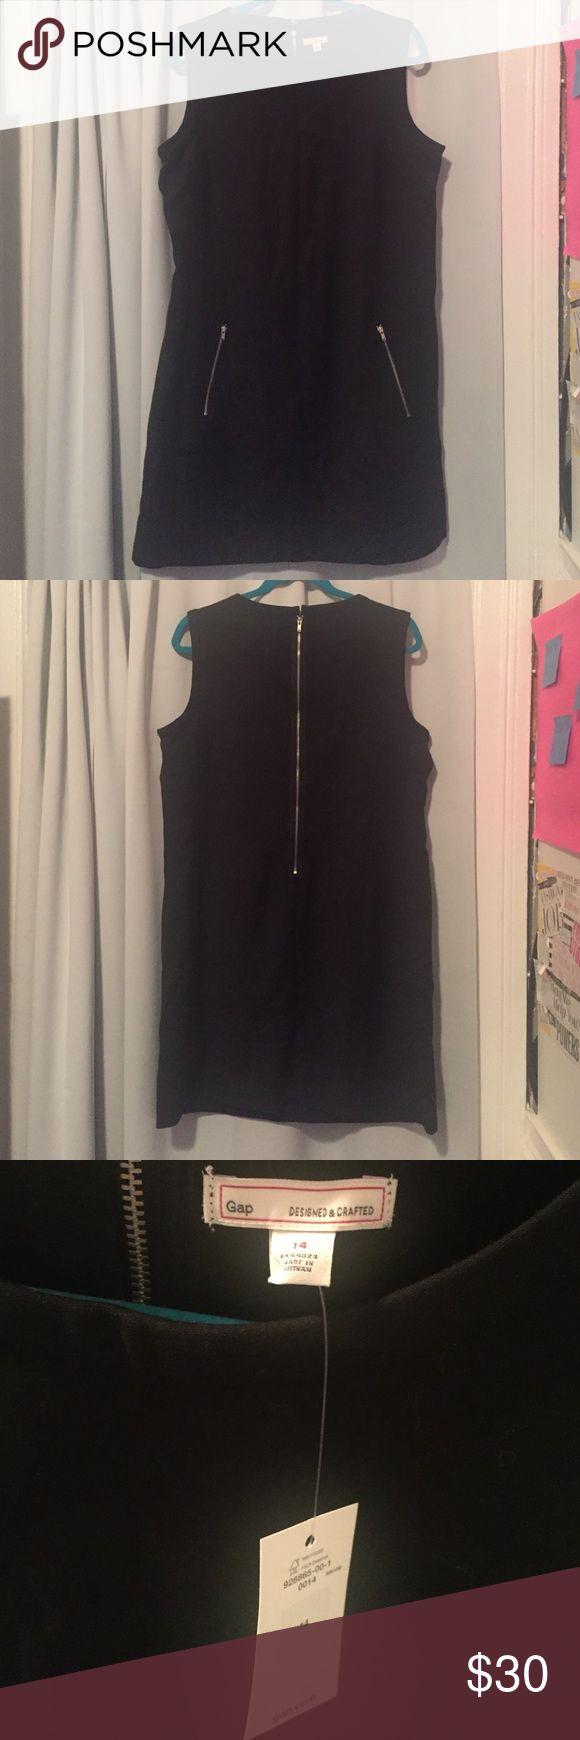 NWT GAP black shift dress with zipper pockets NWT GAP black shift dress with zipper pockets. Size 14. GAP Dresses